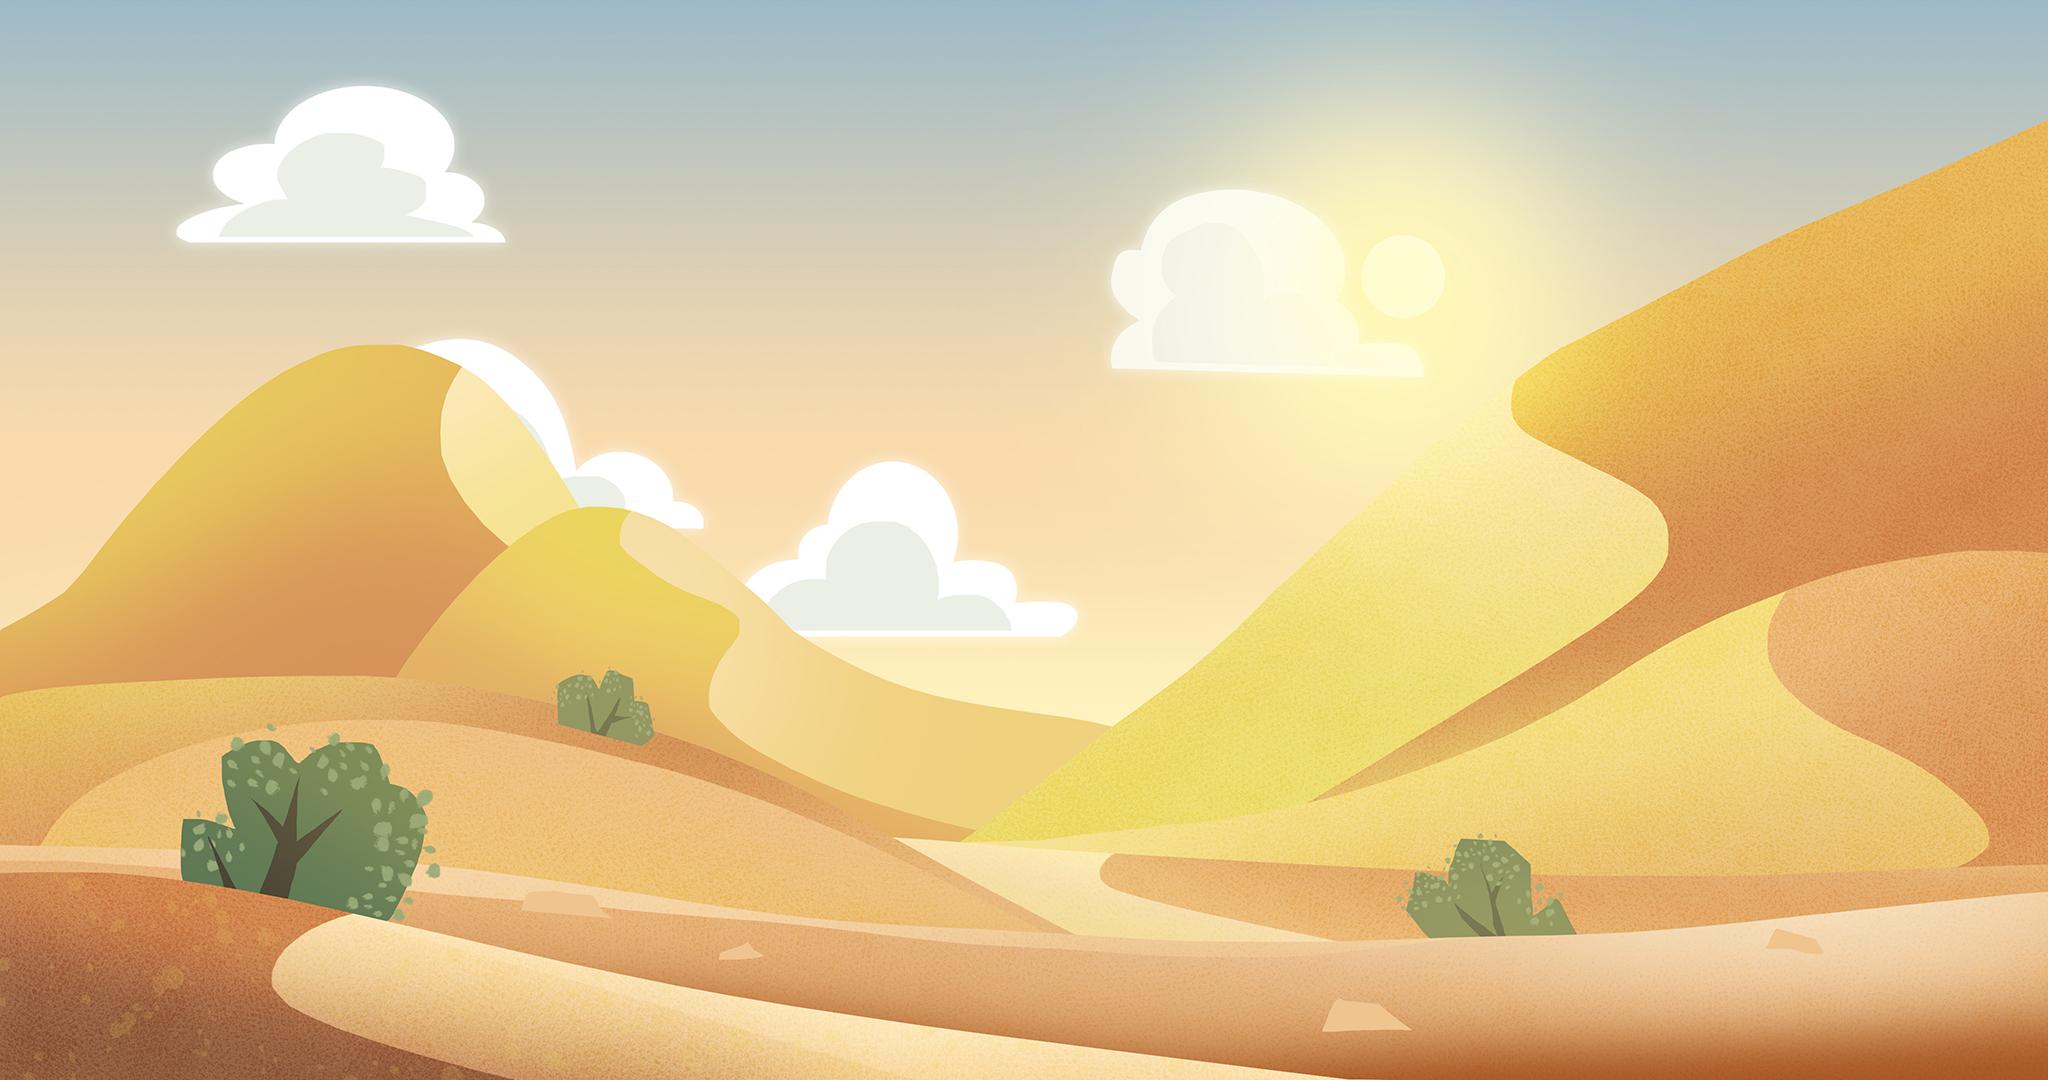 Coastal_Animation_Desert_01.jpg